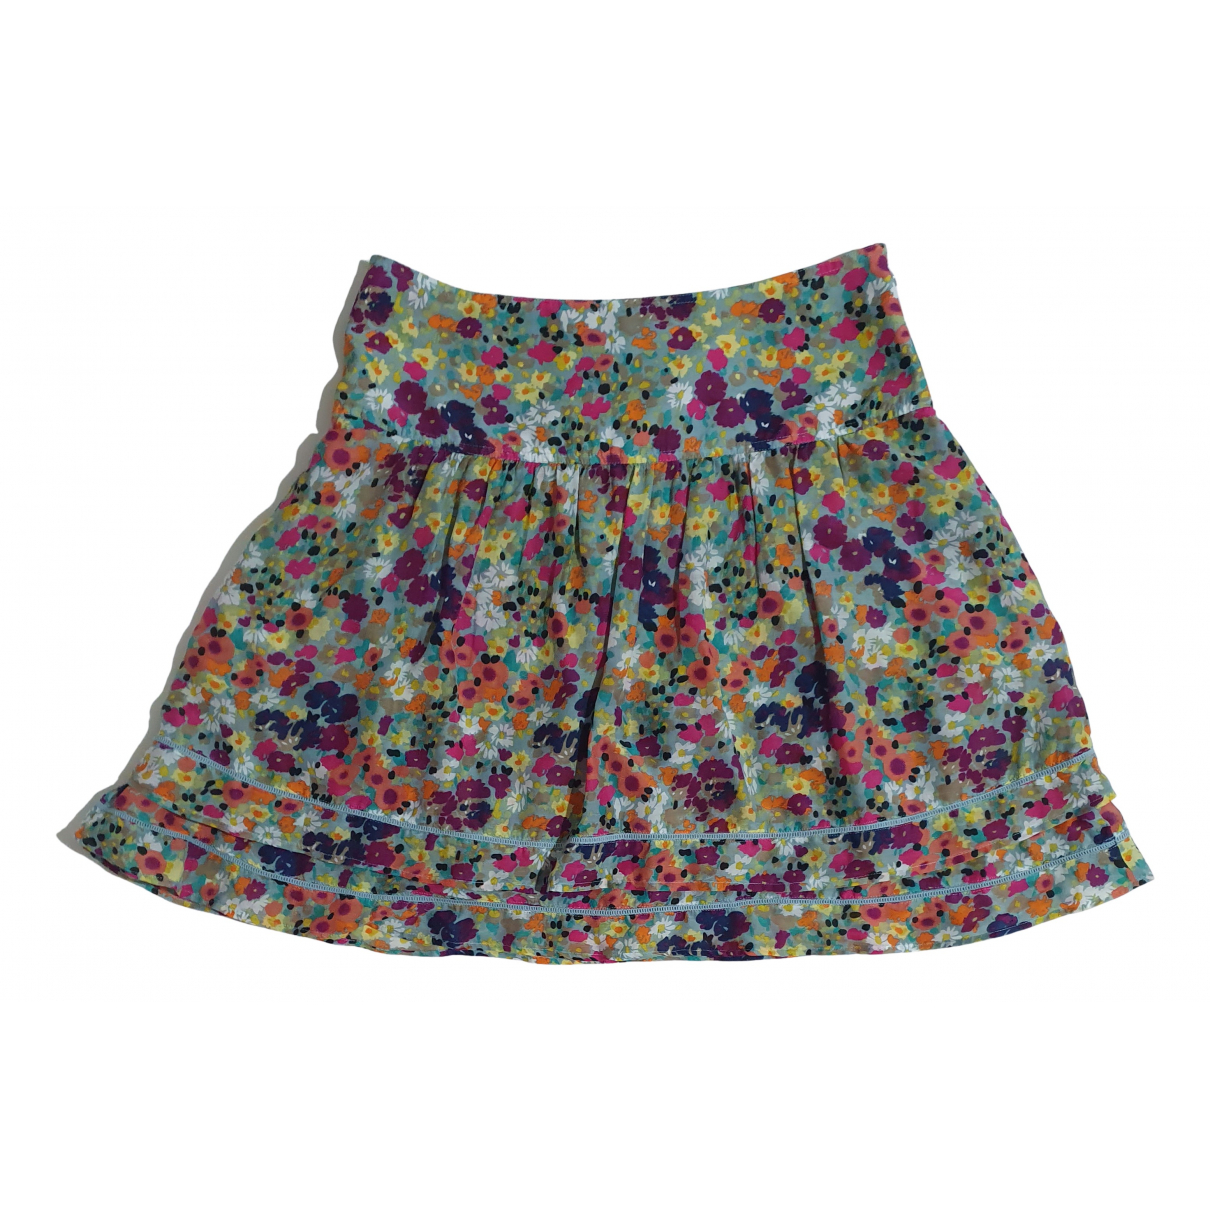 Essentiel Antwerp N Multicolour Cotton skirt for Women 40 FR